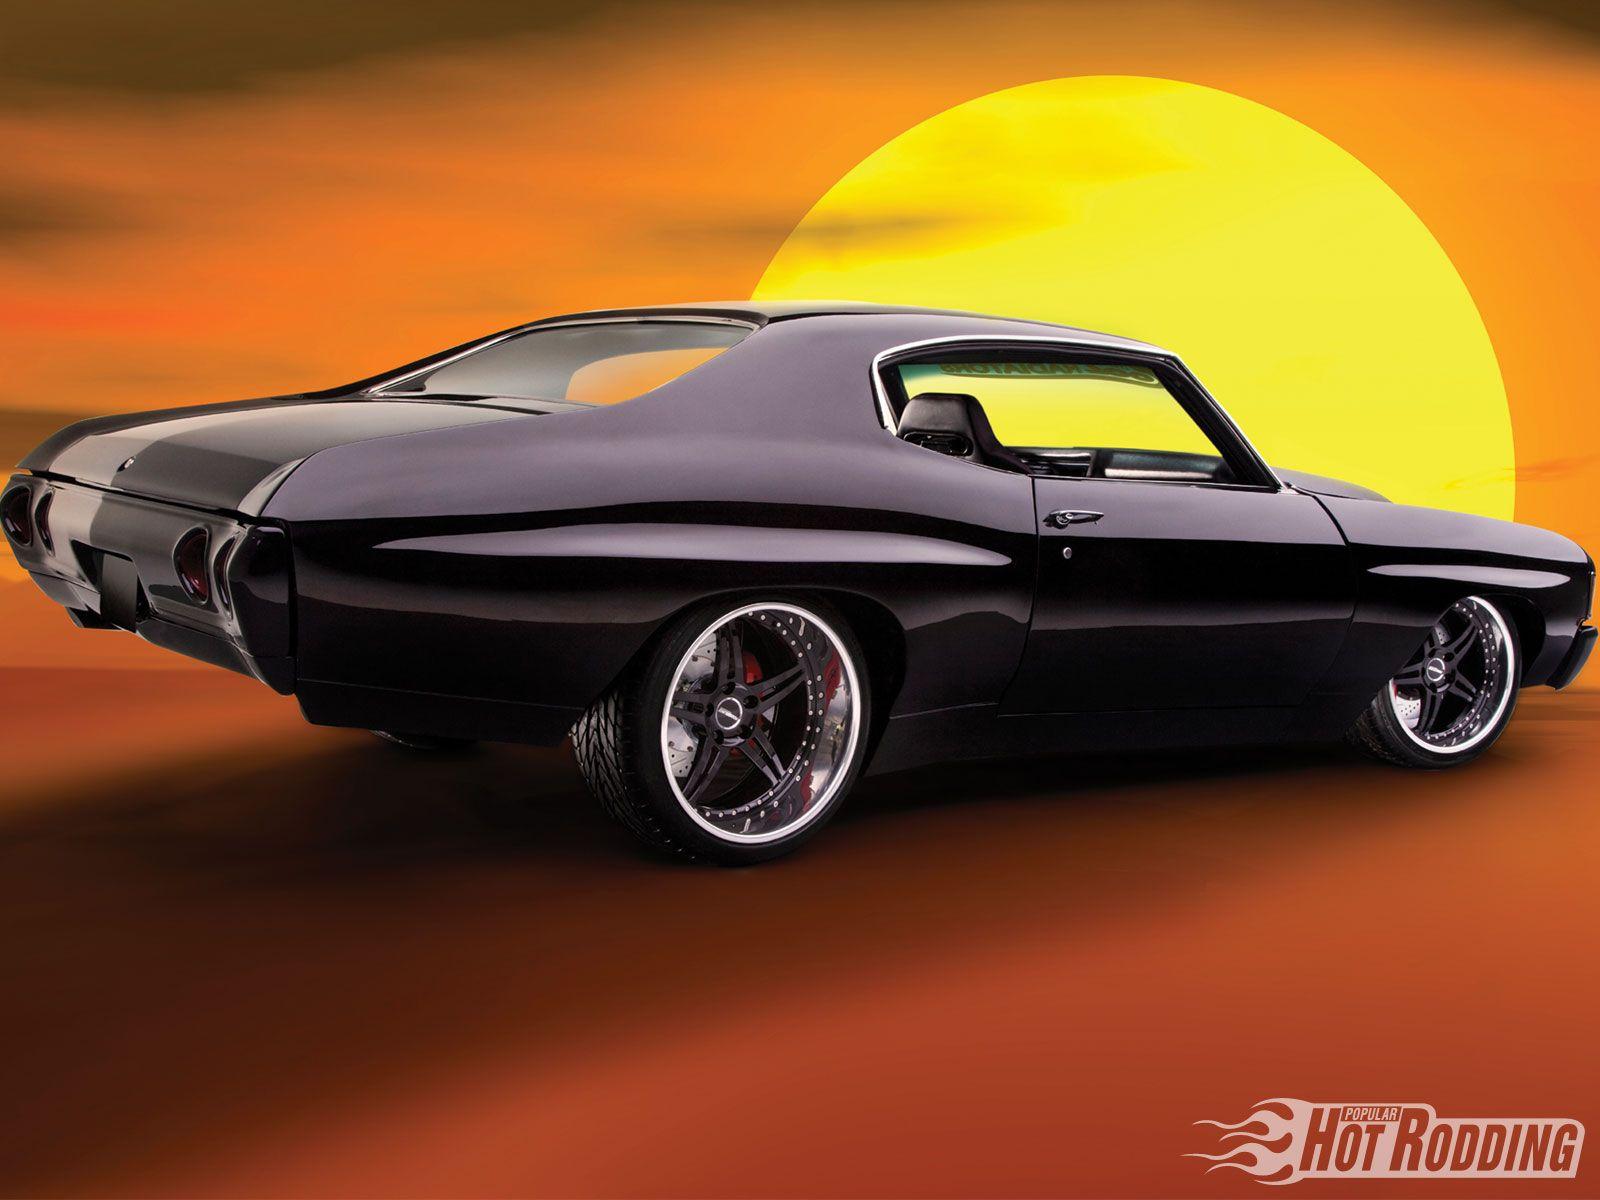 1972 chevy chevelle rear right widebody kit forgeline split 5 star wheels